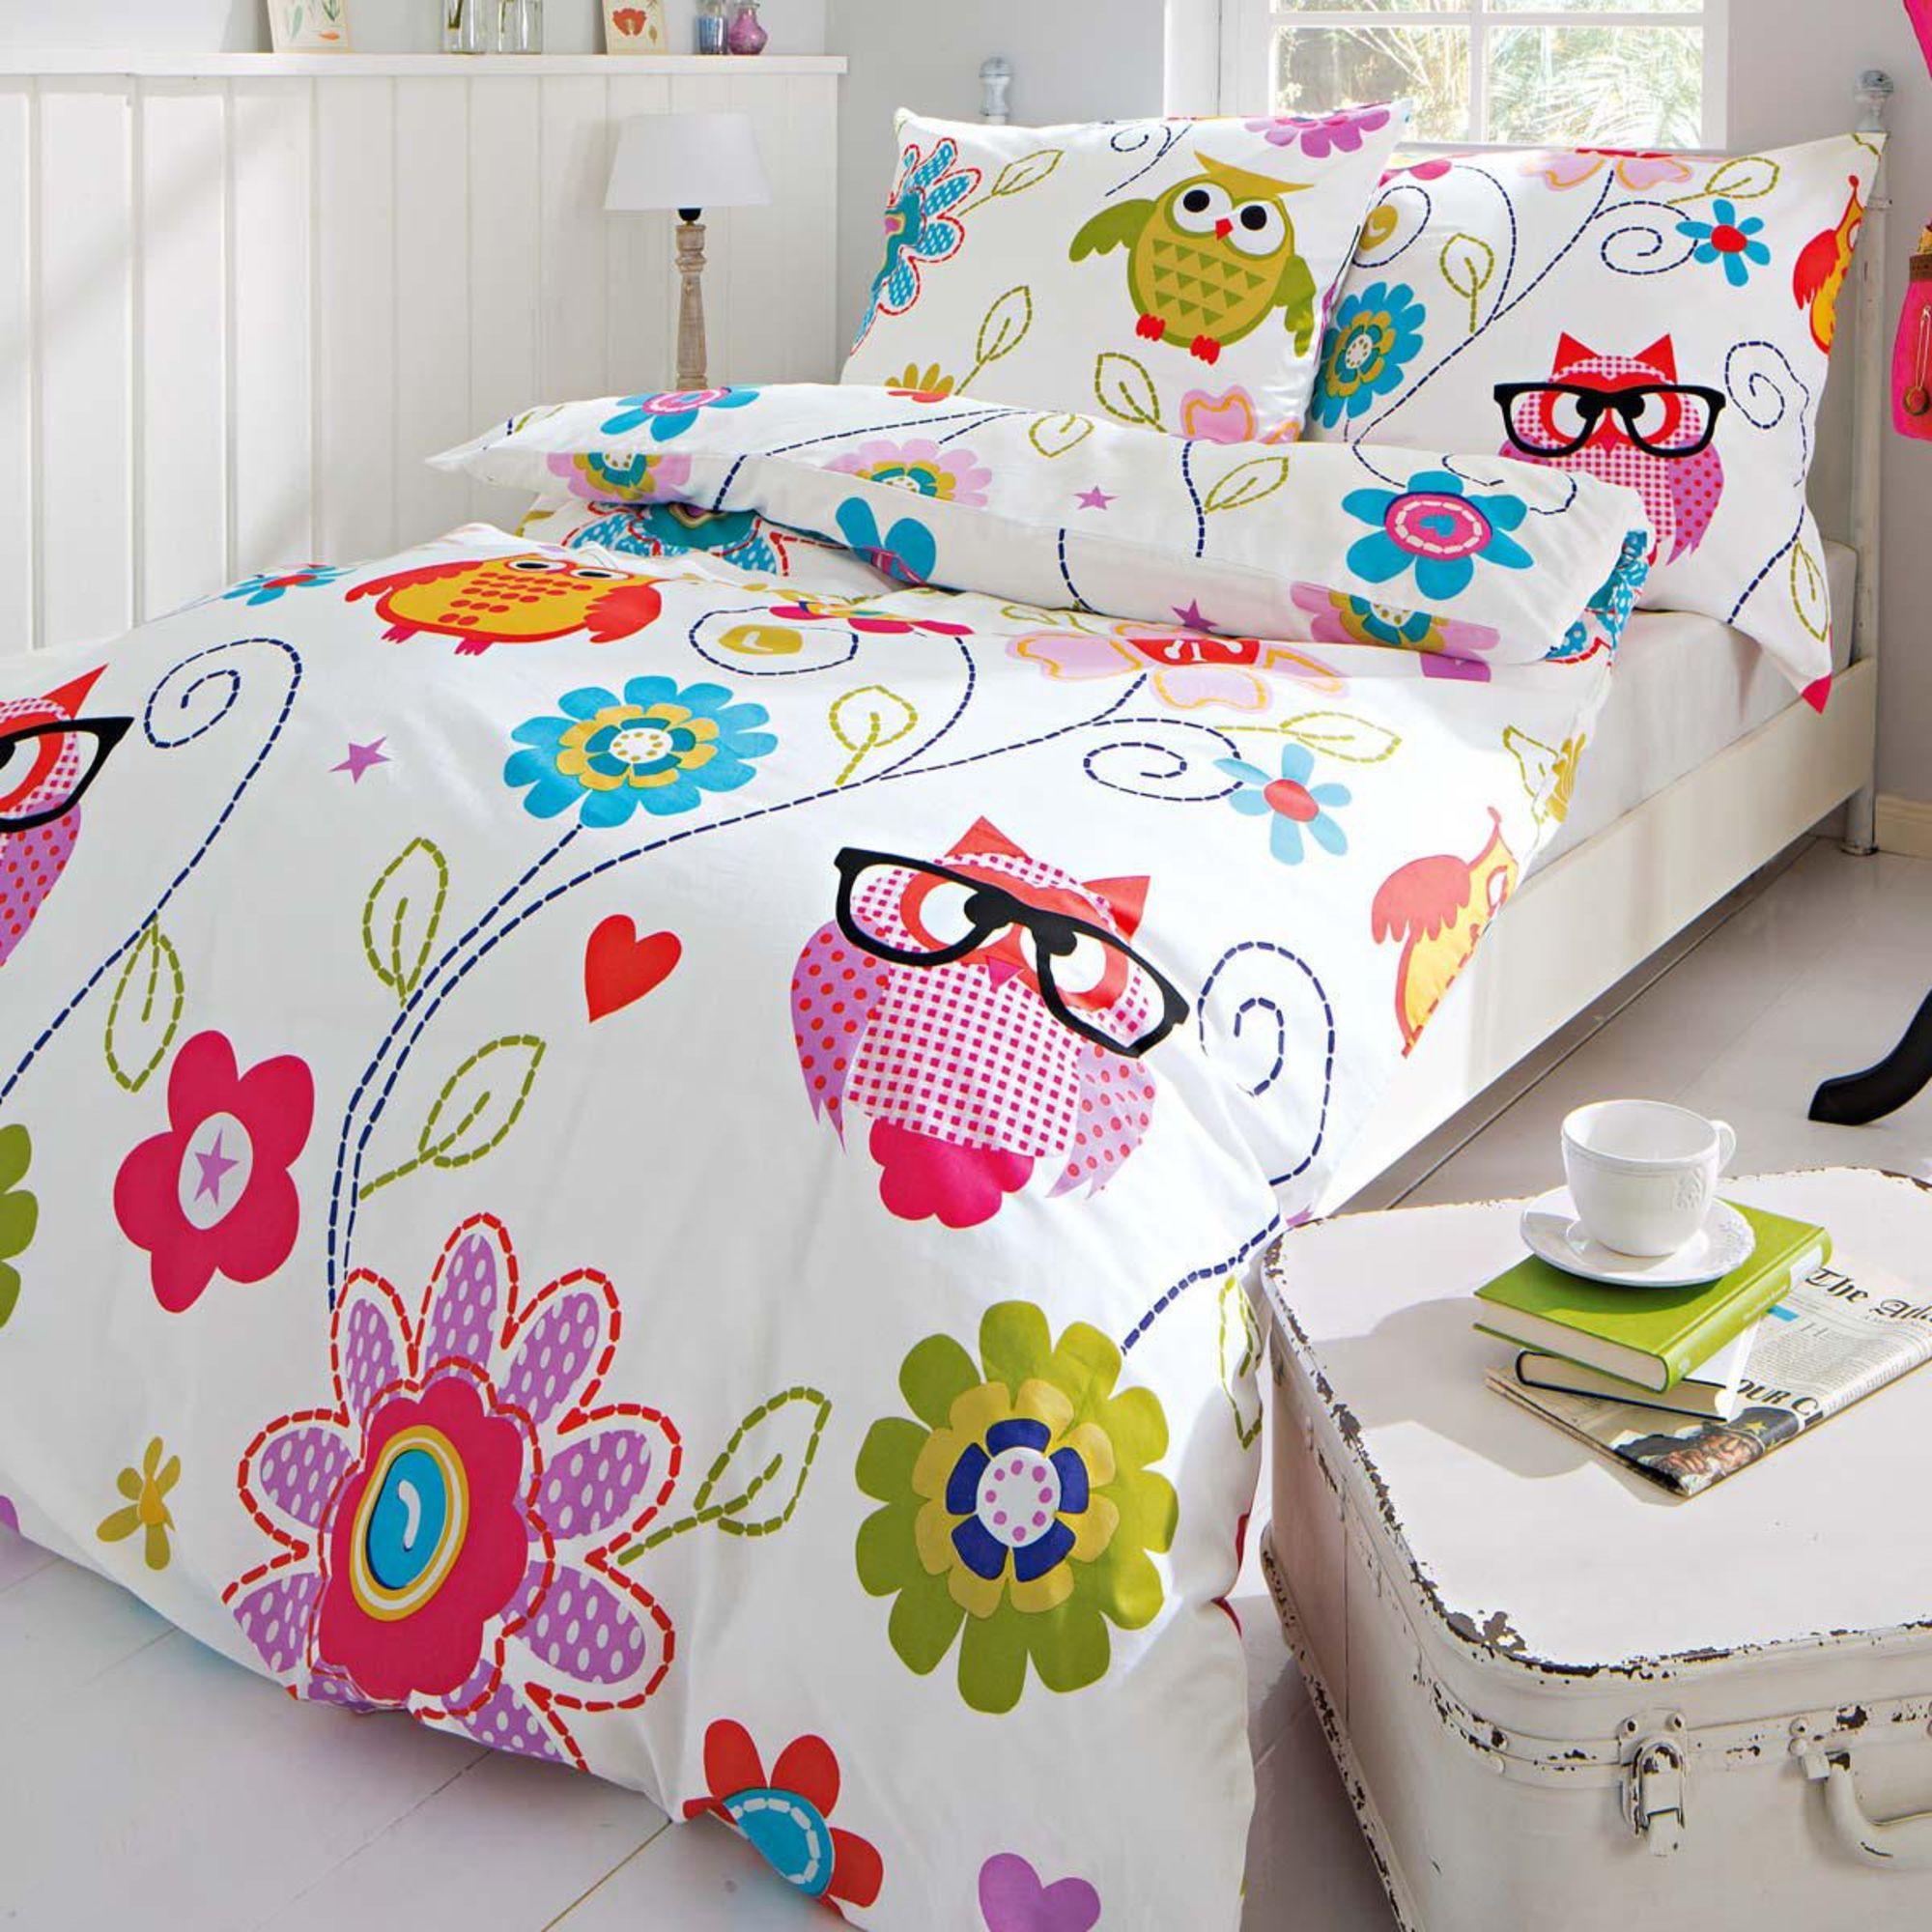 lidl bettw sche eule my blog. Black Bedroom Furniture Sets. Home Design Ideas